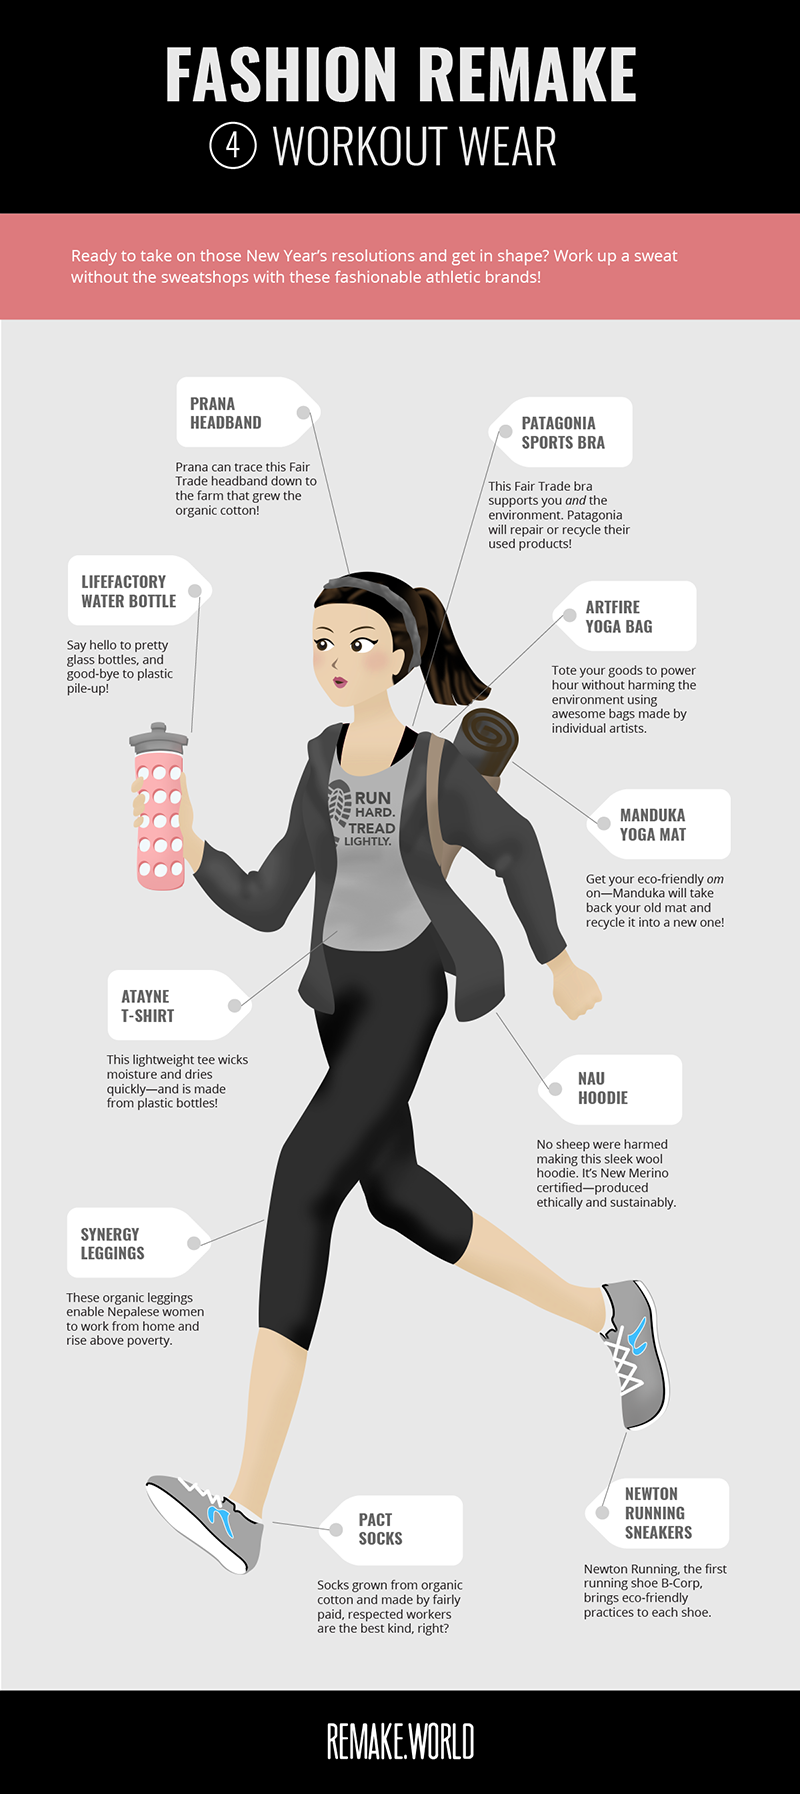 Fashion Remake - Workout Wear